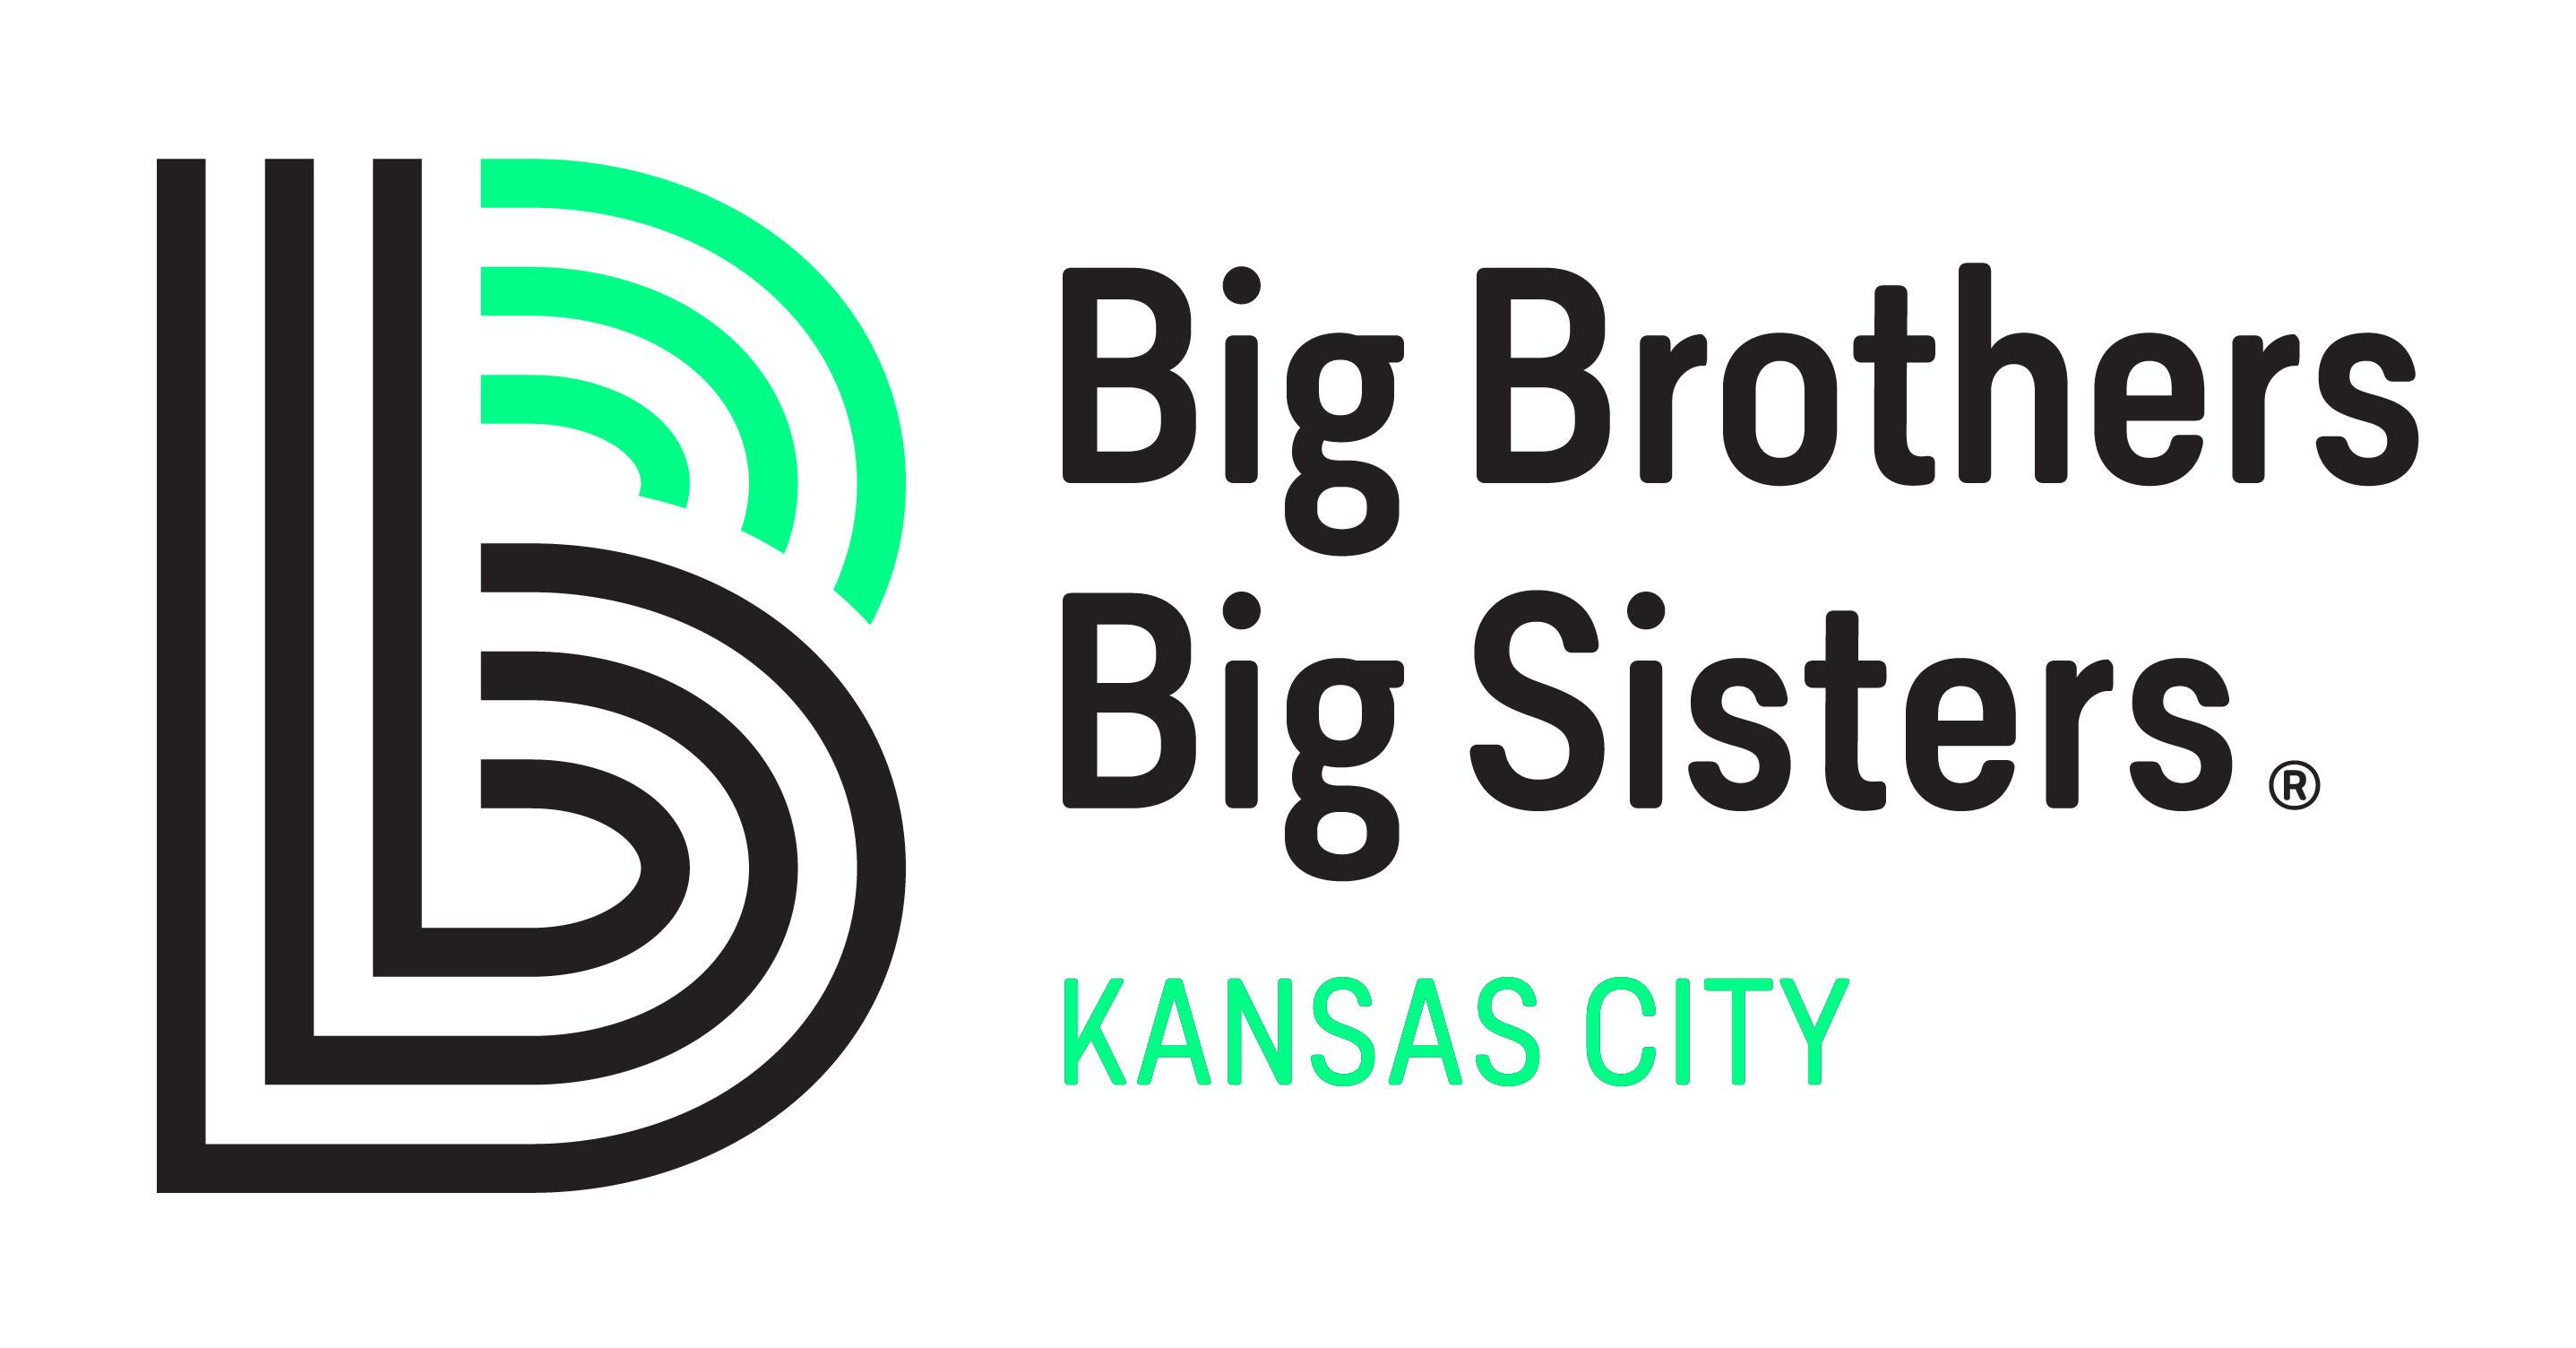 L'Jarius Sneed's Dreambuilders Fund in support of Big Brothers Big Sisters Kansas City